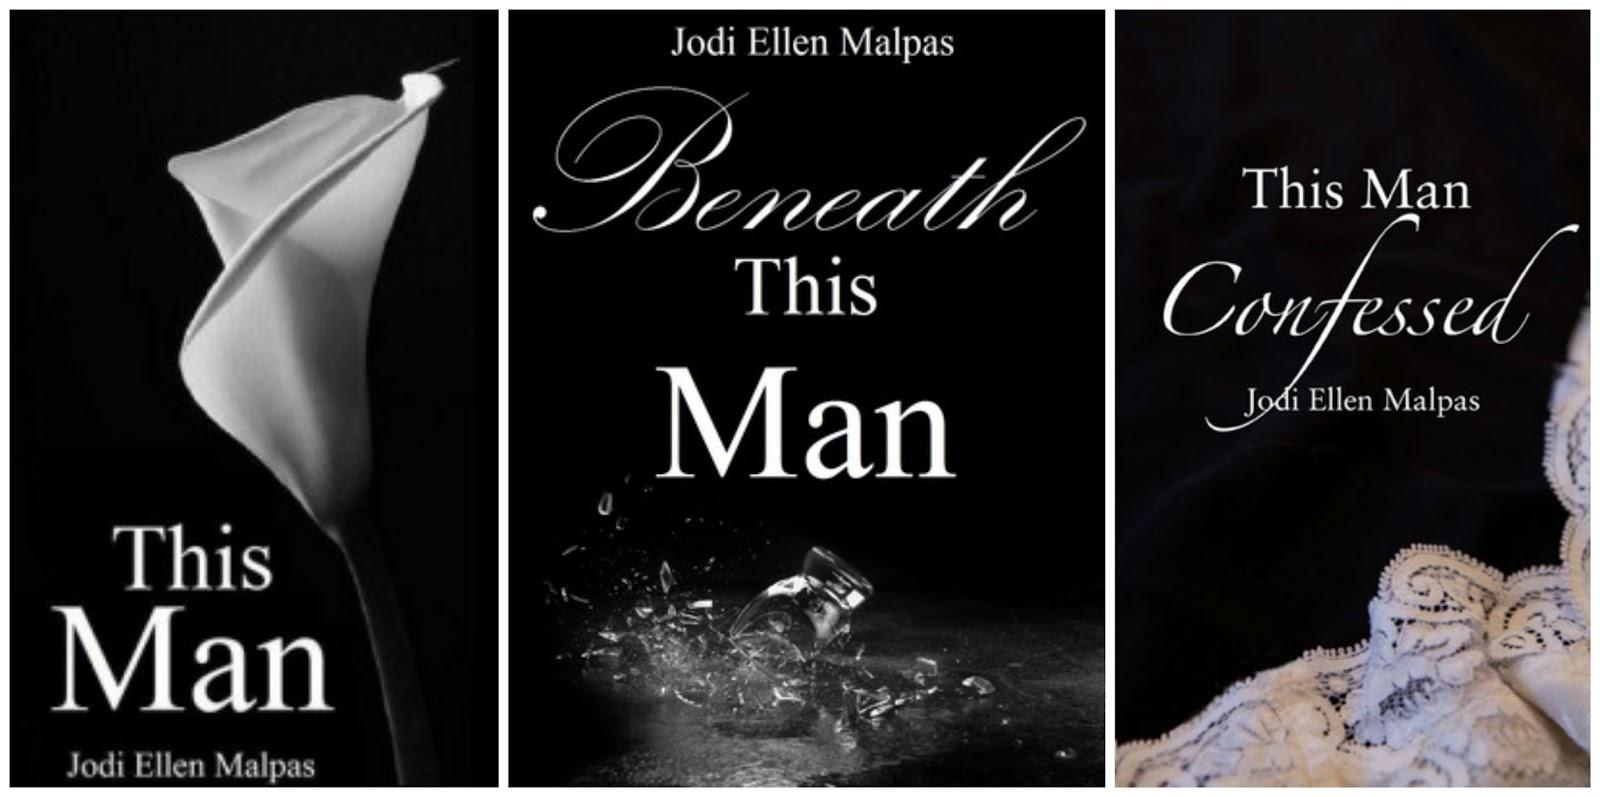 Video Interview with Jodi Ellen Malpas: Signed Book Giveaway